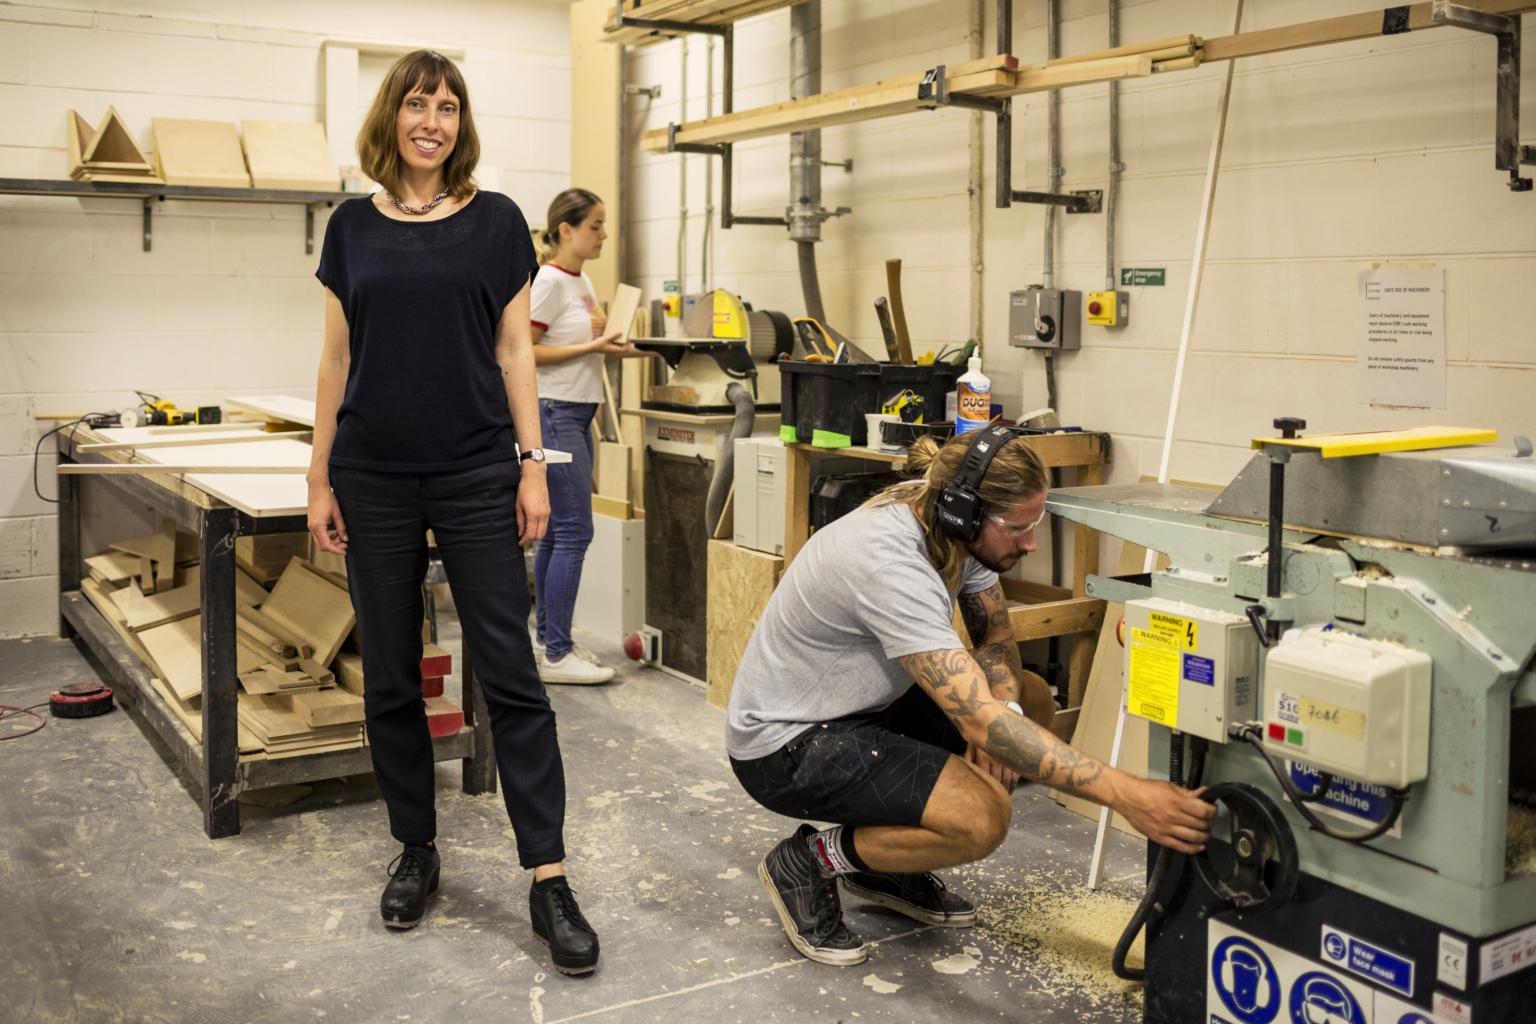 New director Laura Simpson and two Edinburgh Sculpture Workshop members. Photo: Ross Fraser McLean / StudioRoRo